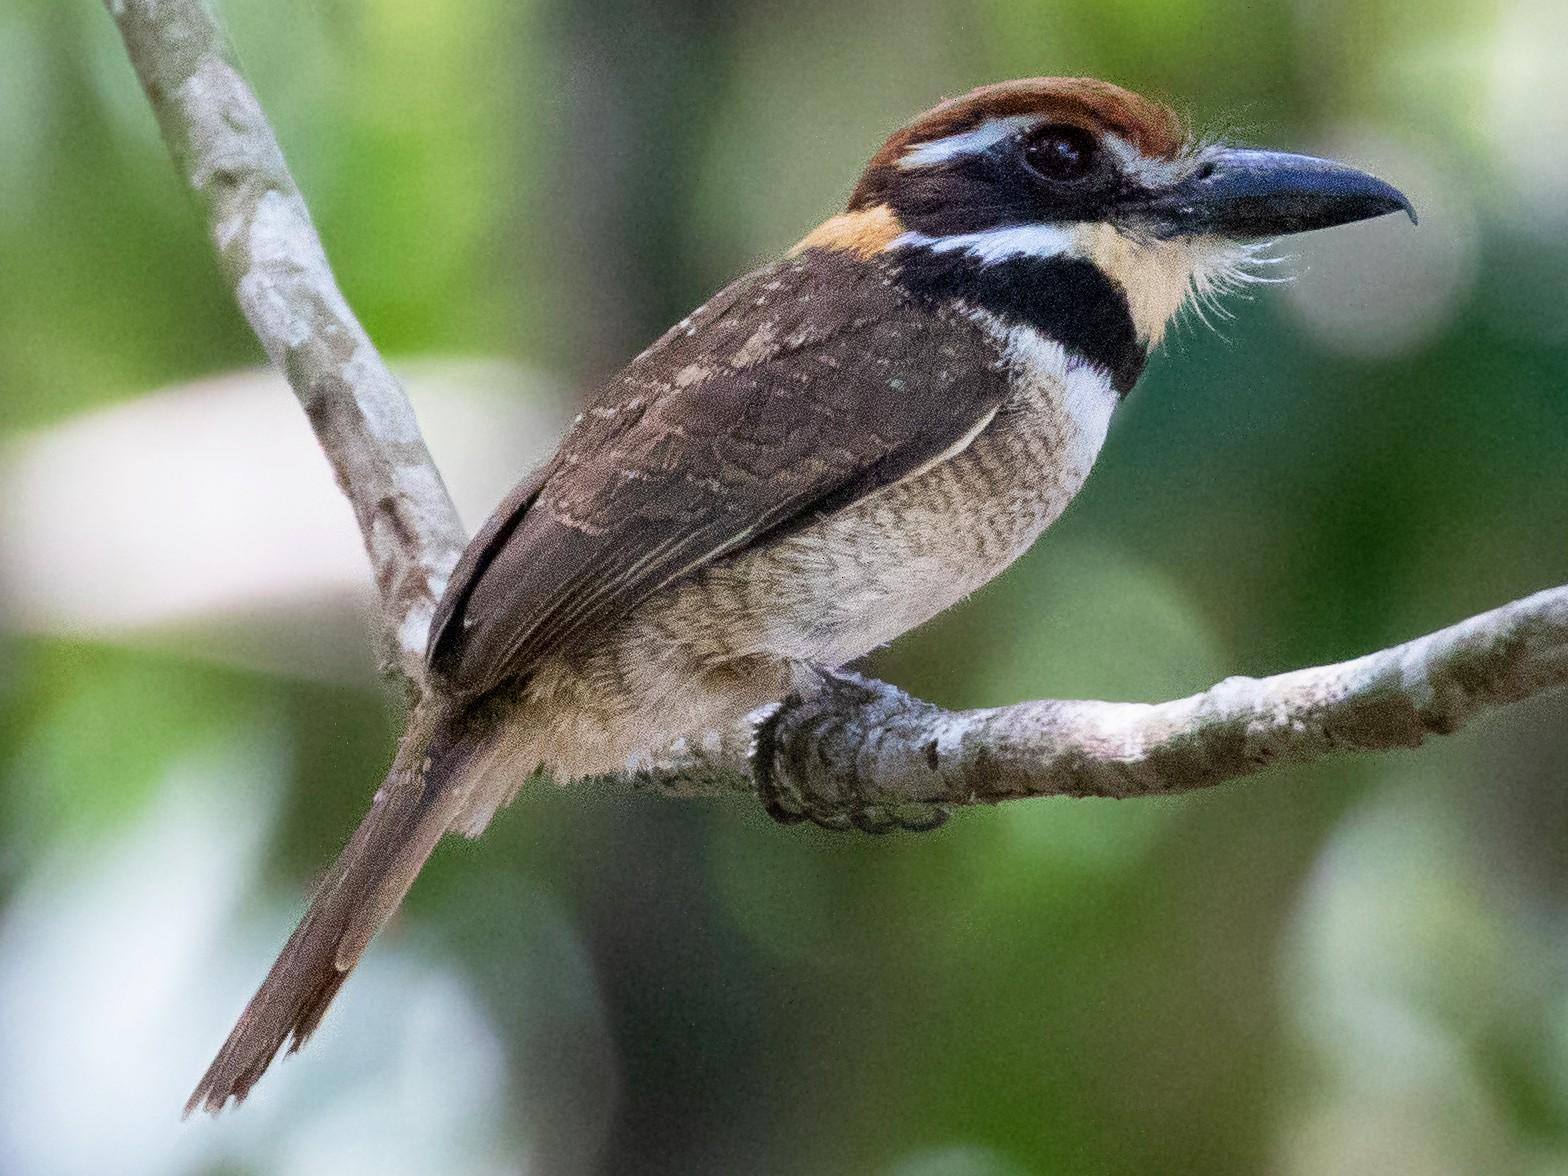 Chestnut-capped Puffbird - Thibaud Aronson